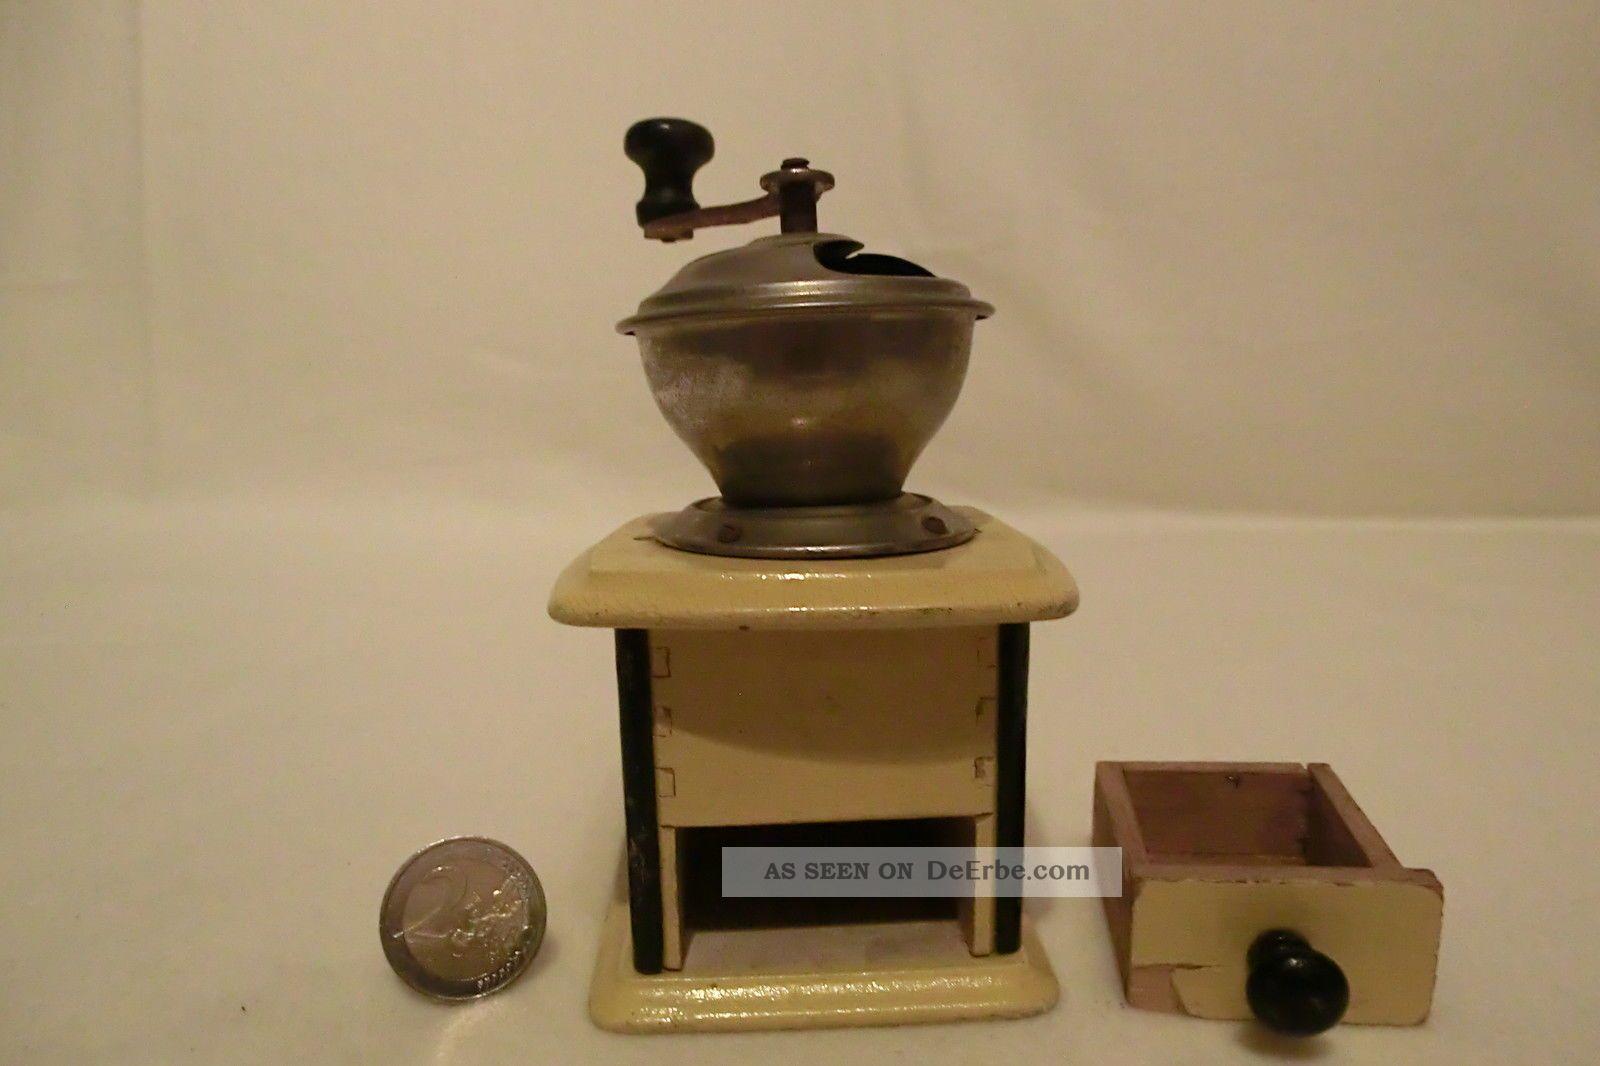 31 alte kaffeem hle f r puppenk che puppenstube holz und blech um 1920. Black Bedroom Furniture Sets. Home Design Ideas